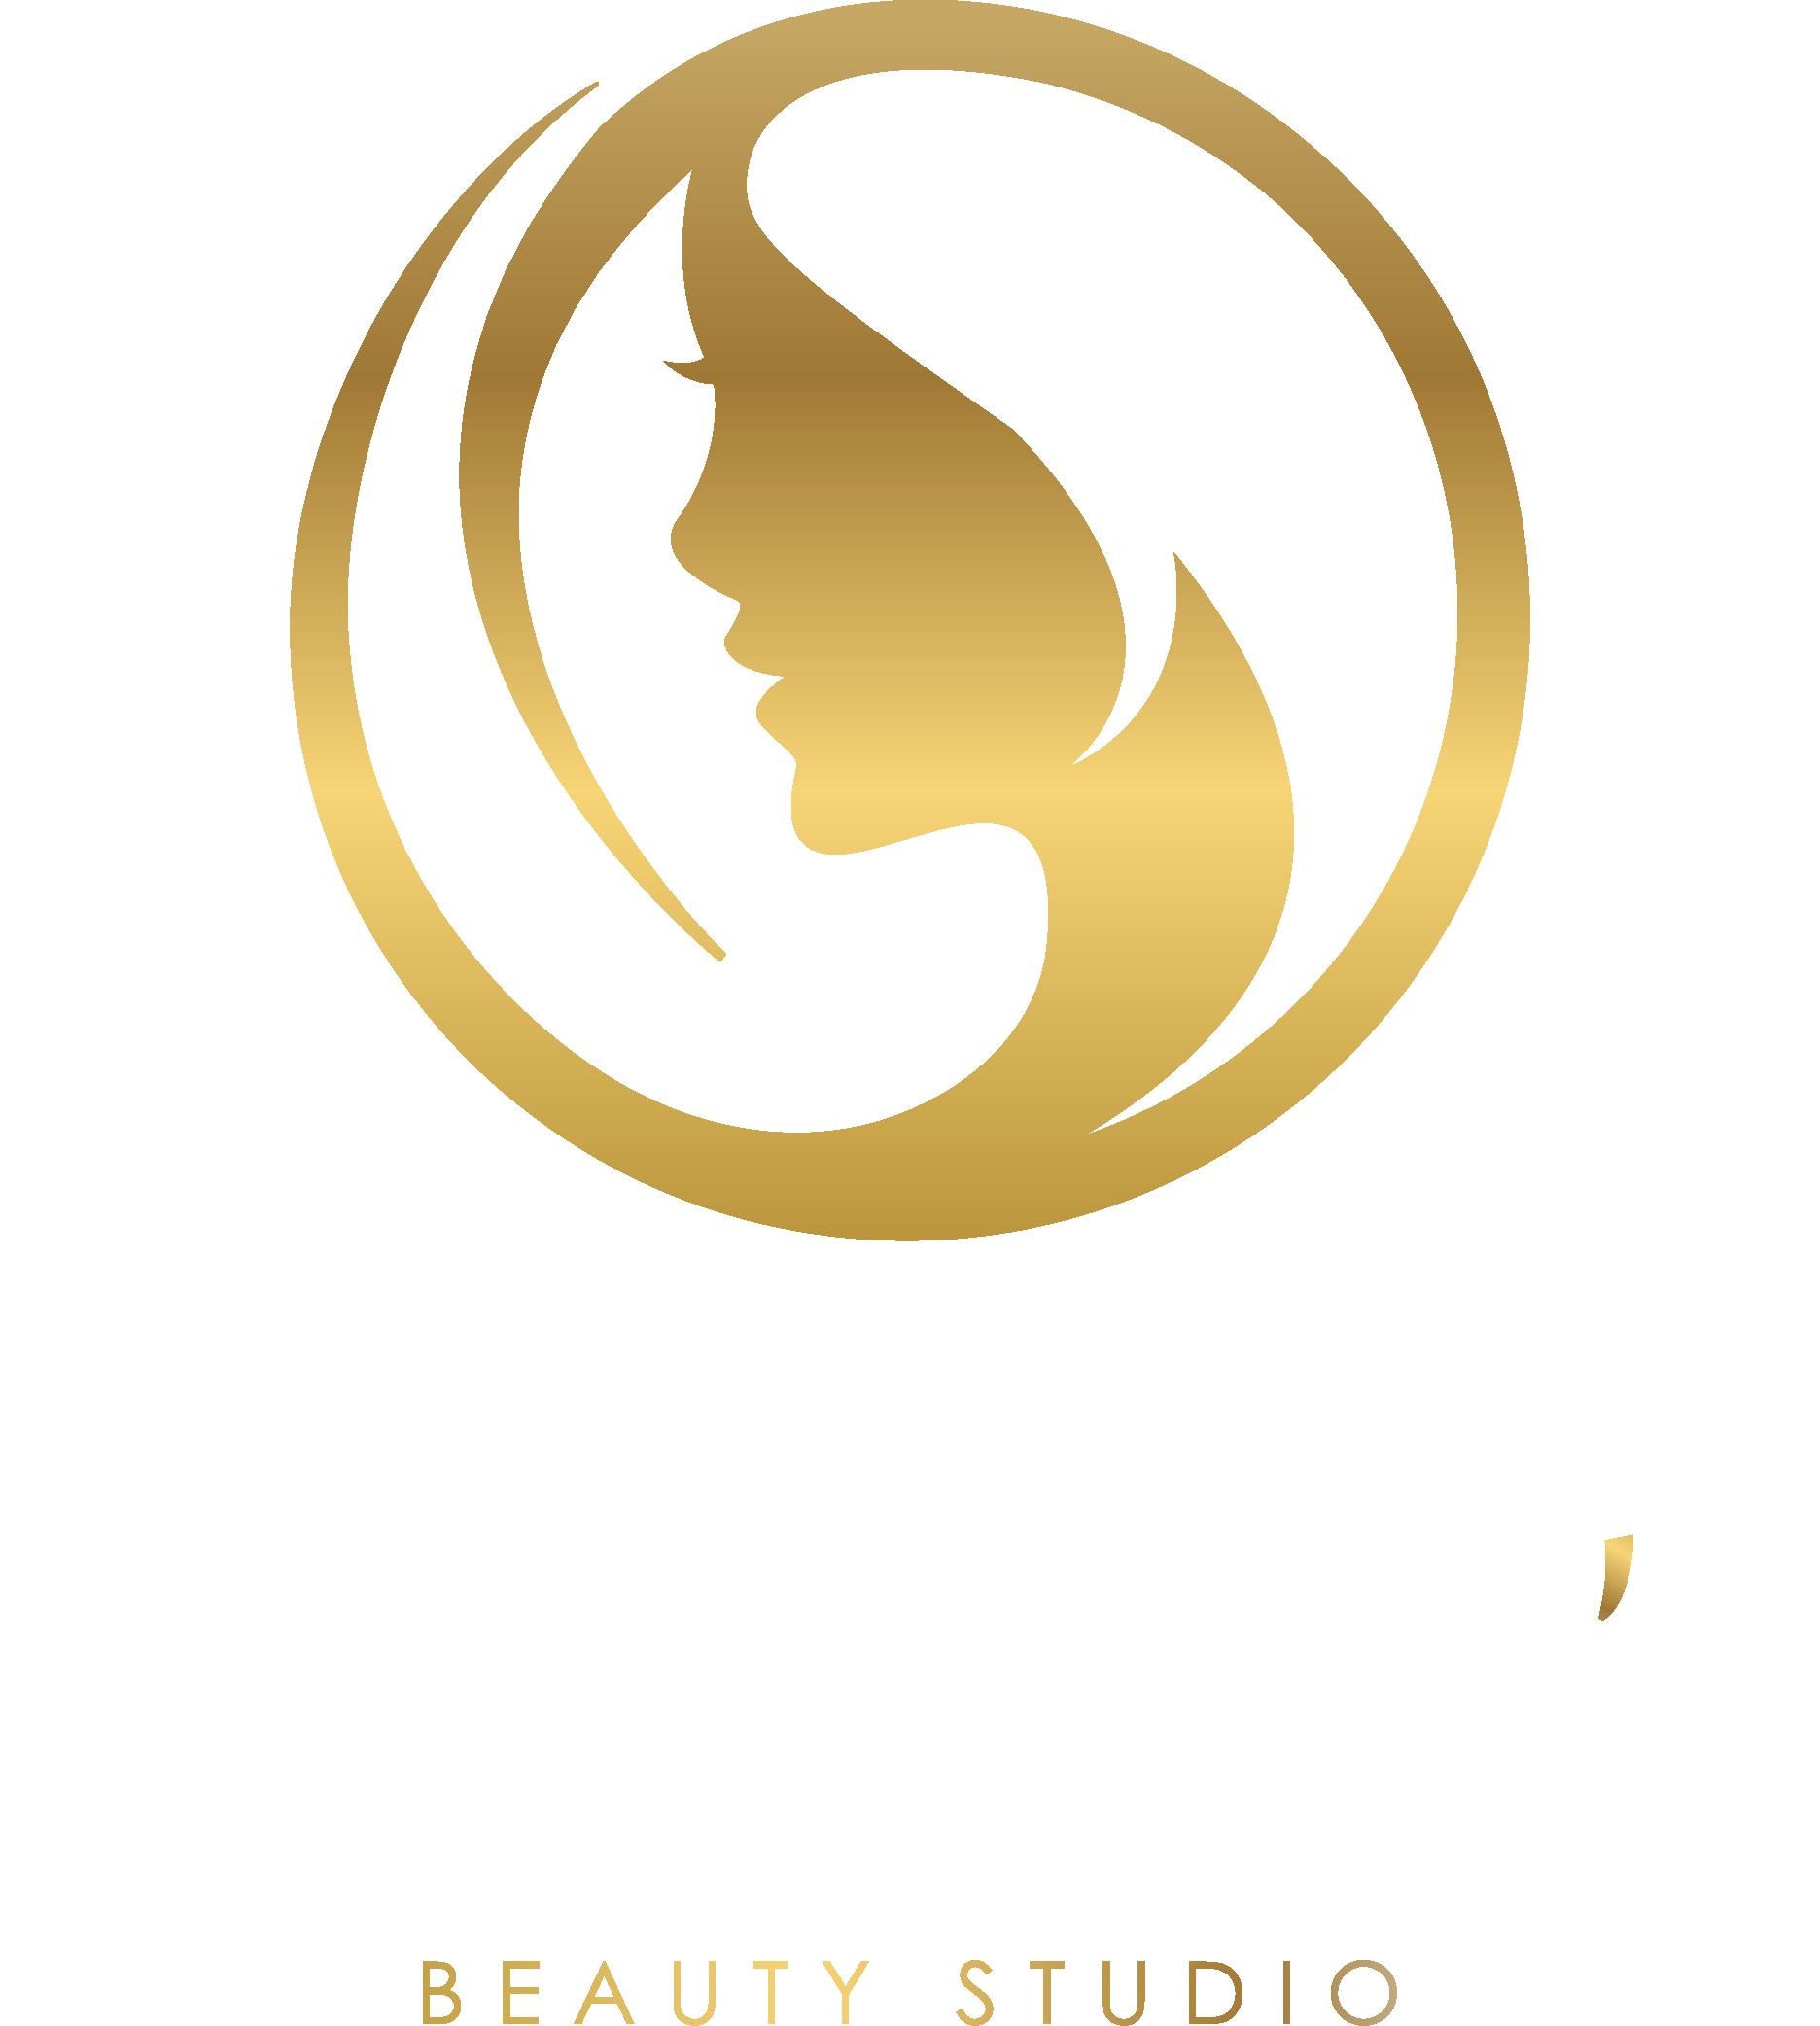 Debora's Beauty Studio Logo, Knightsbridge, London.